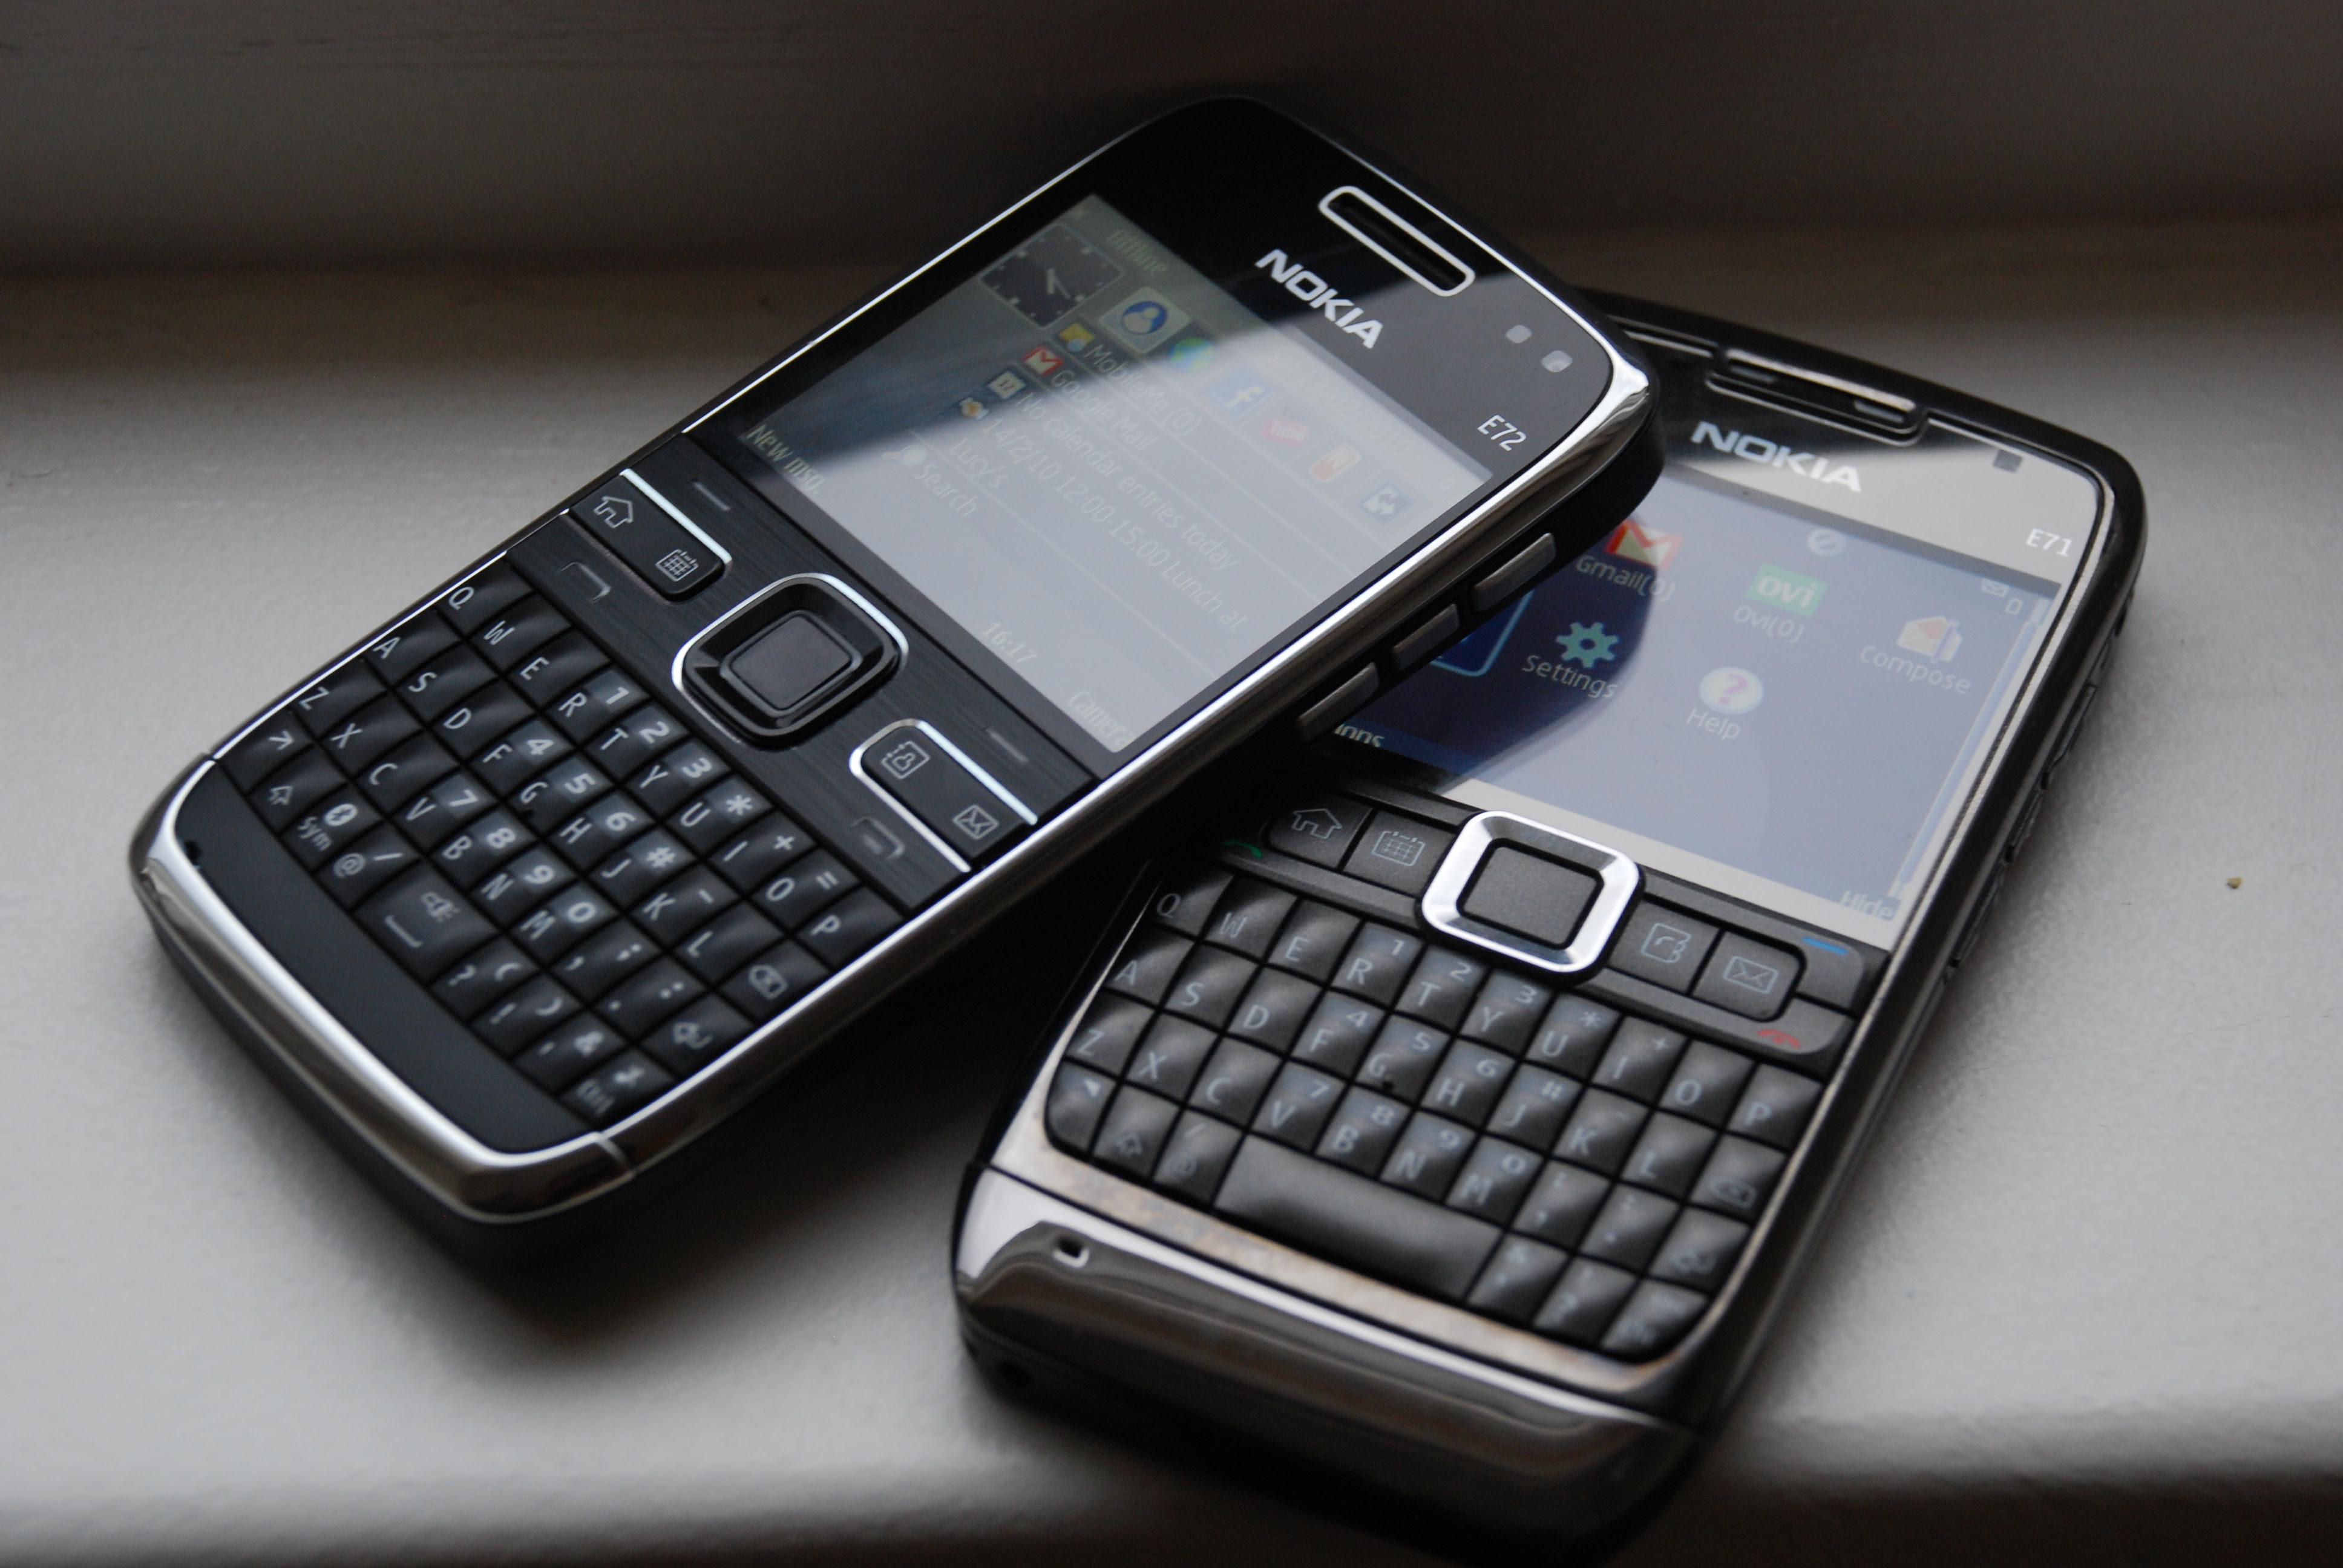 Download 100+ Wallpaper Bergerak Nokia E71  Gratis